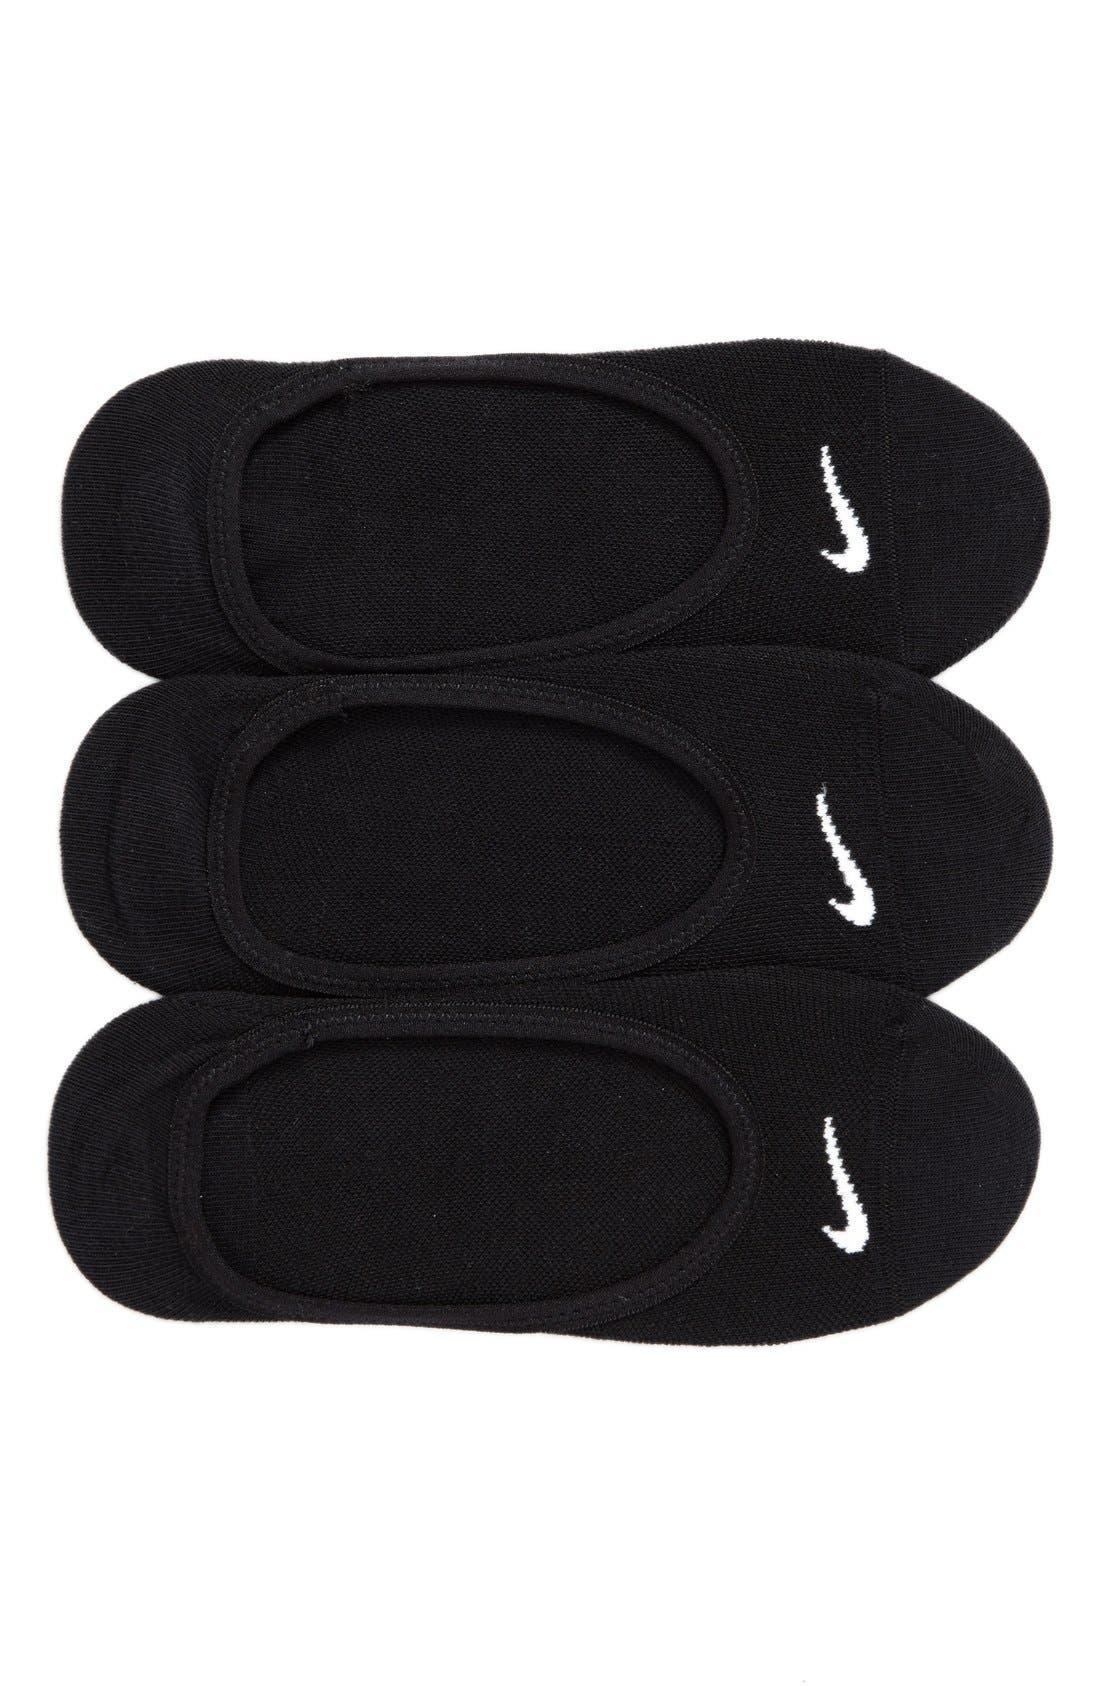 Alternate Image 3  - Nike 3-Pack No-Show Socks